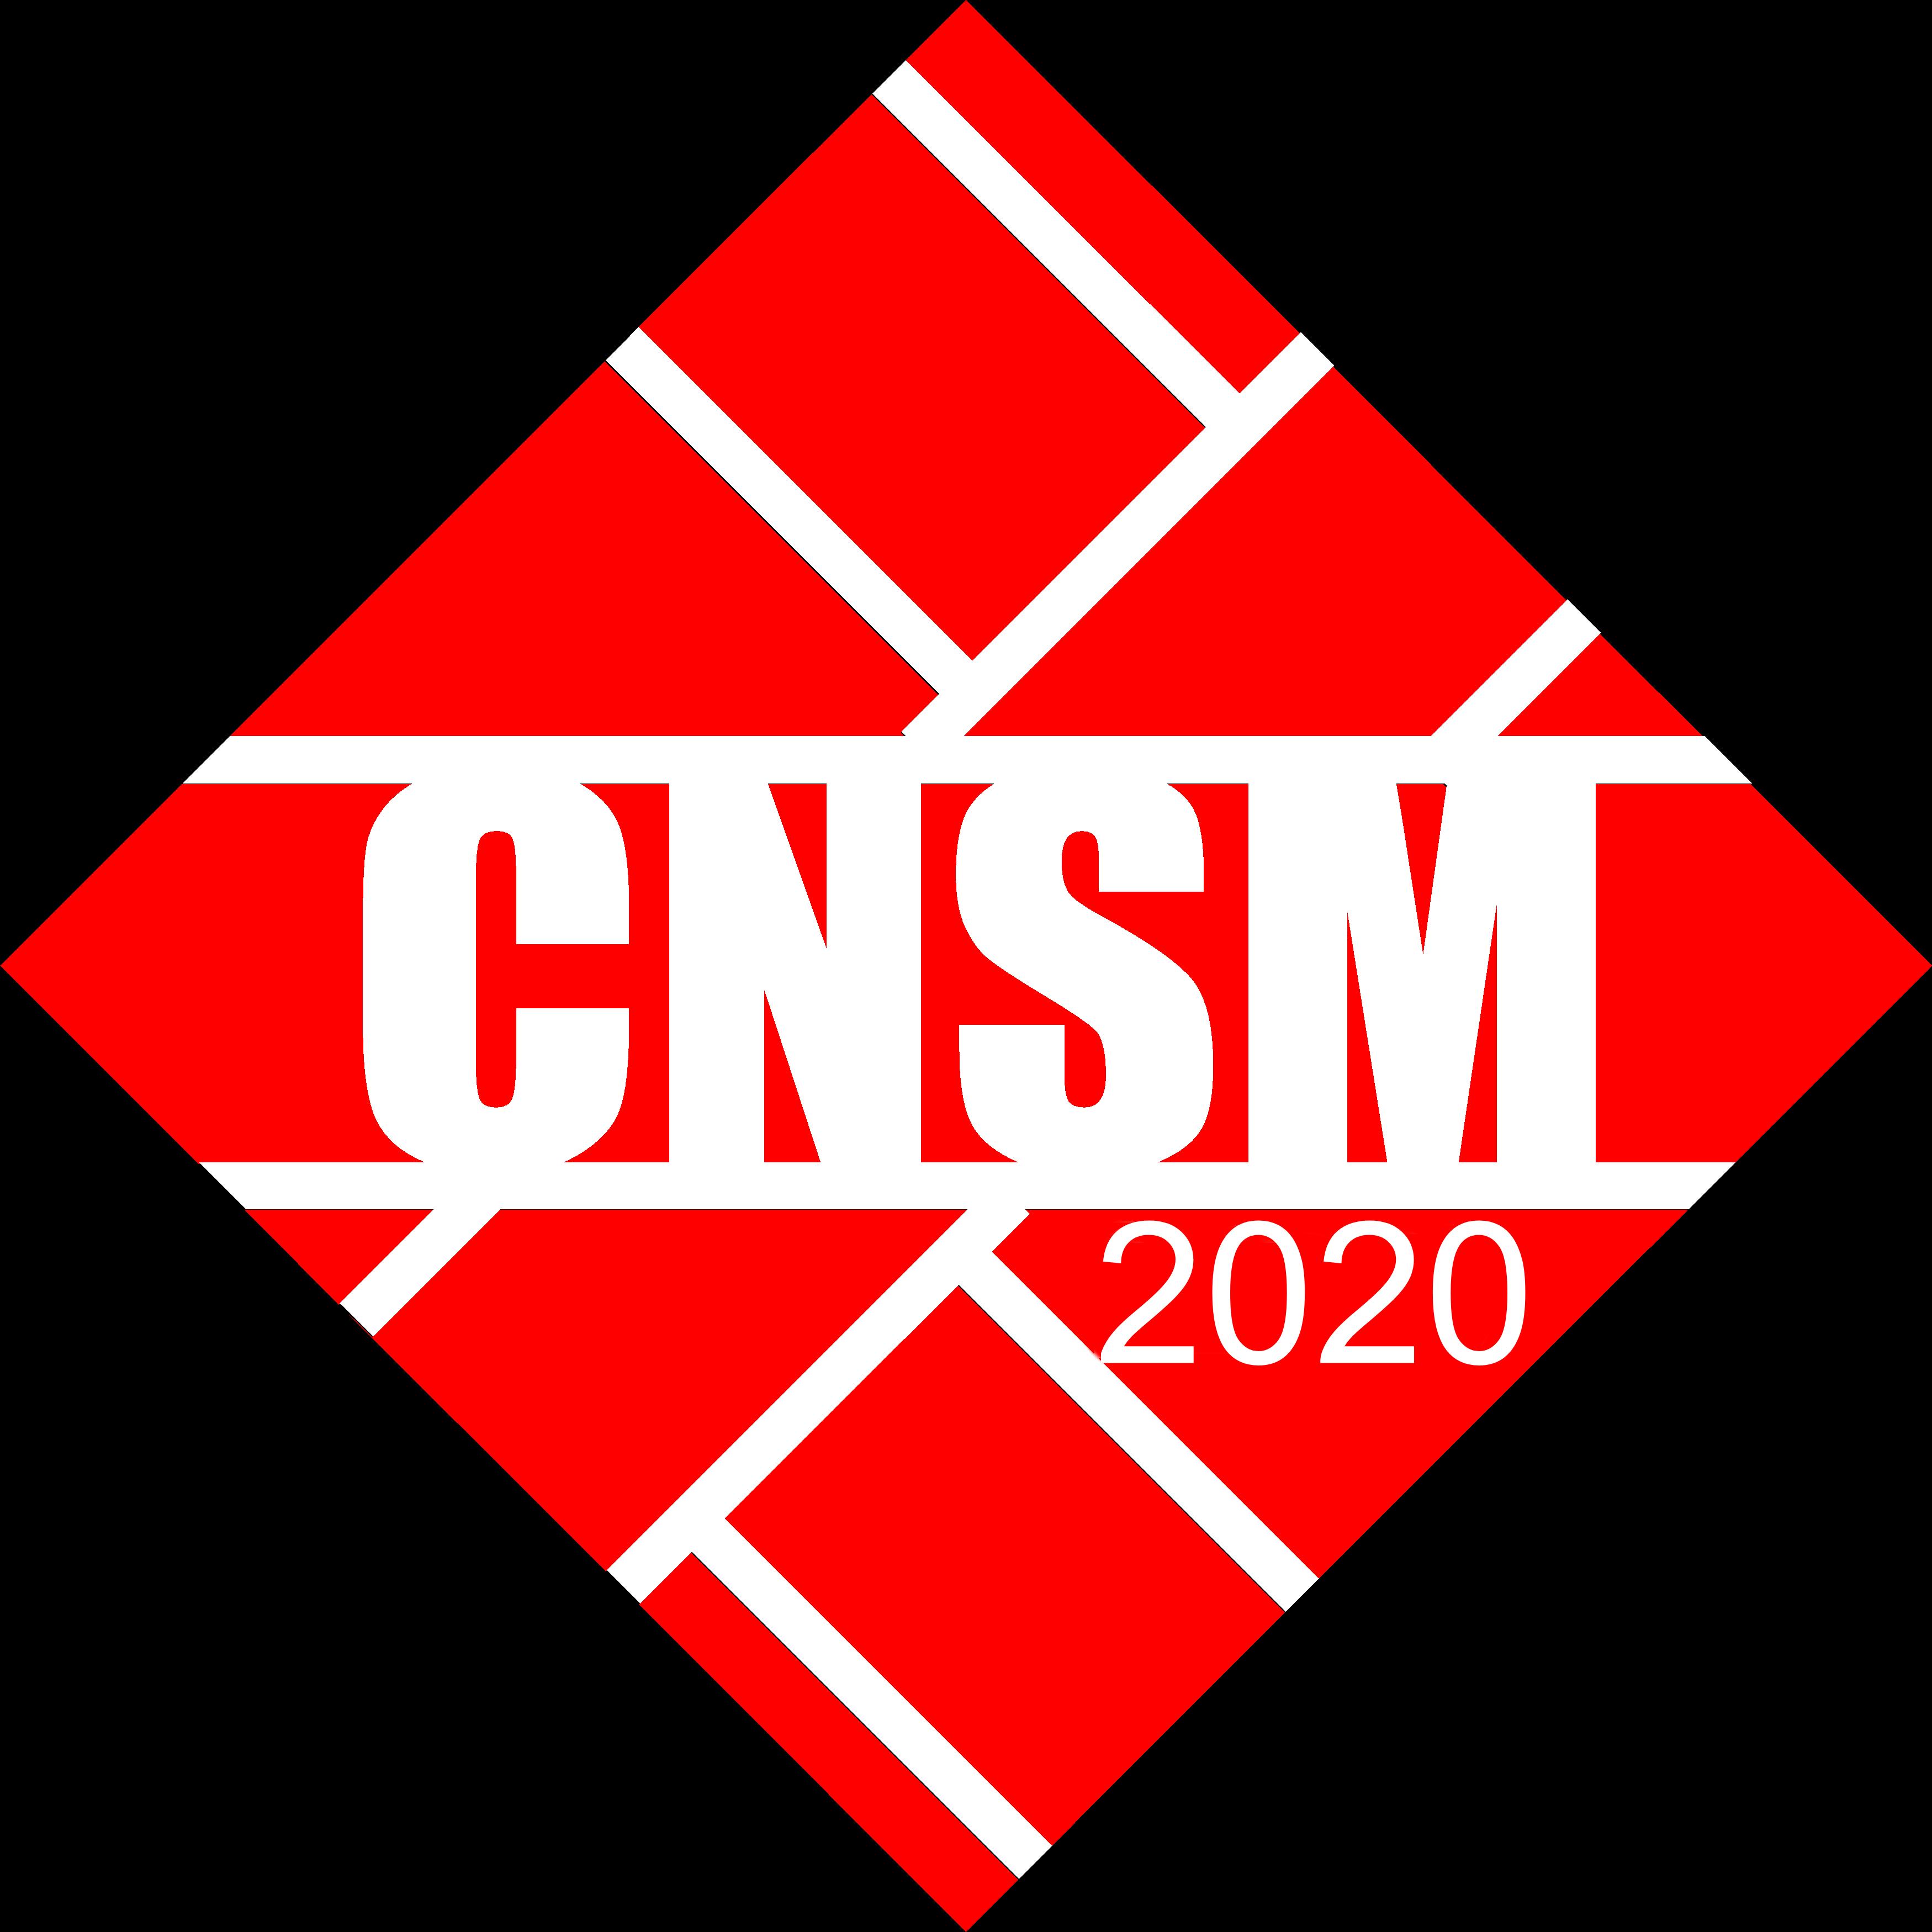 CNSM (International Conference on Network and Service Management)